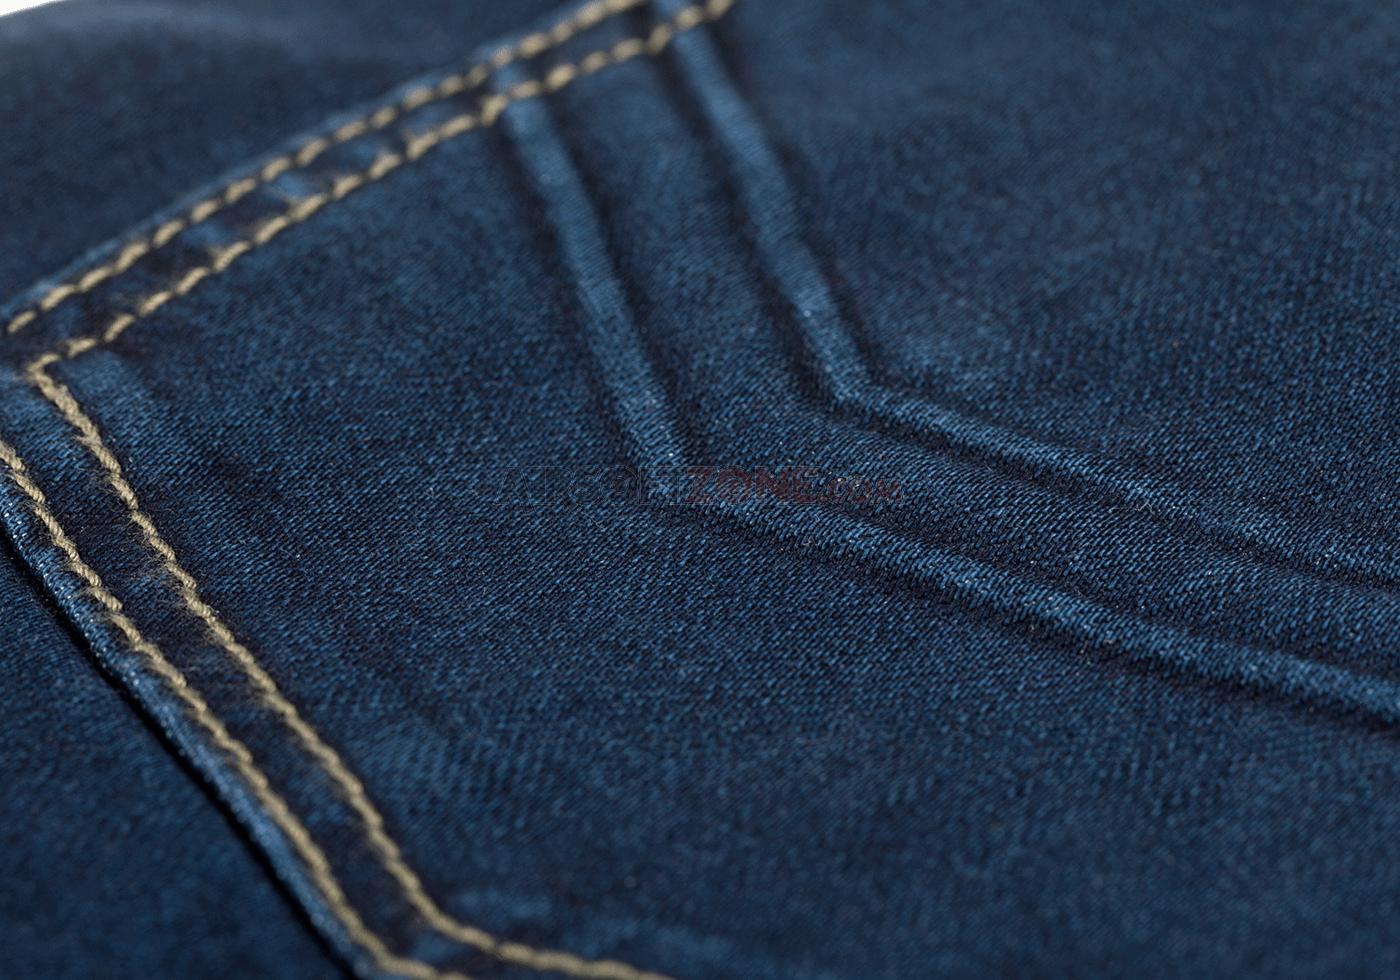 a502a1fcc2b5 Blue Denim Tactical Flex Jeans Midnight Washed (Clawgear) 29/32 - Jeans -  Pants - Garments - airsoftzone.com Online shop